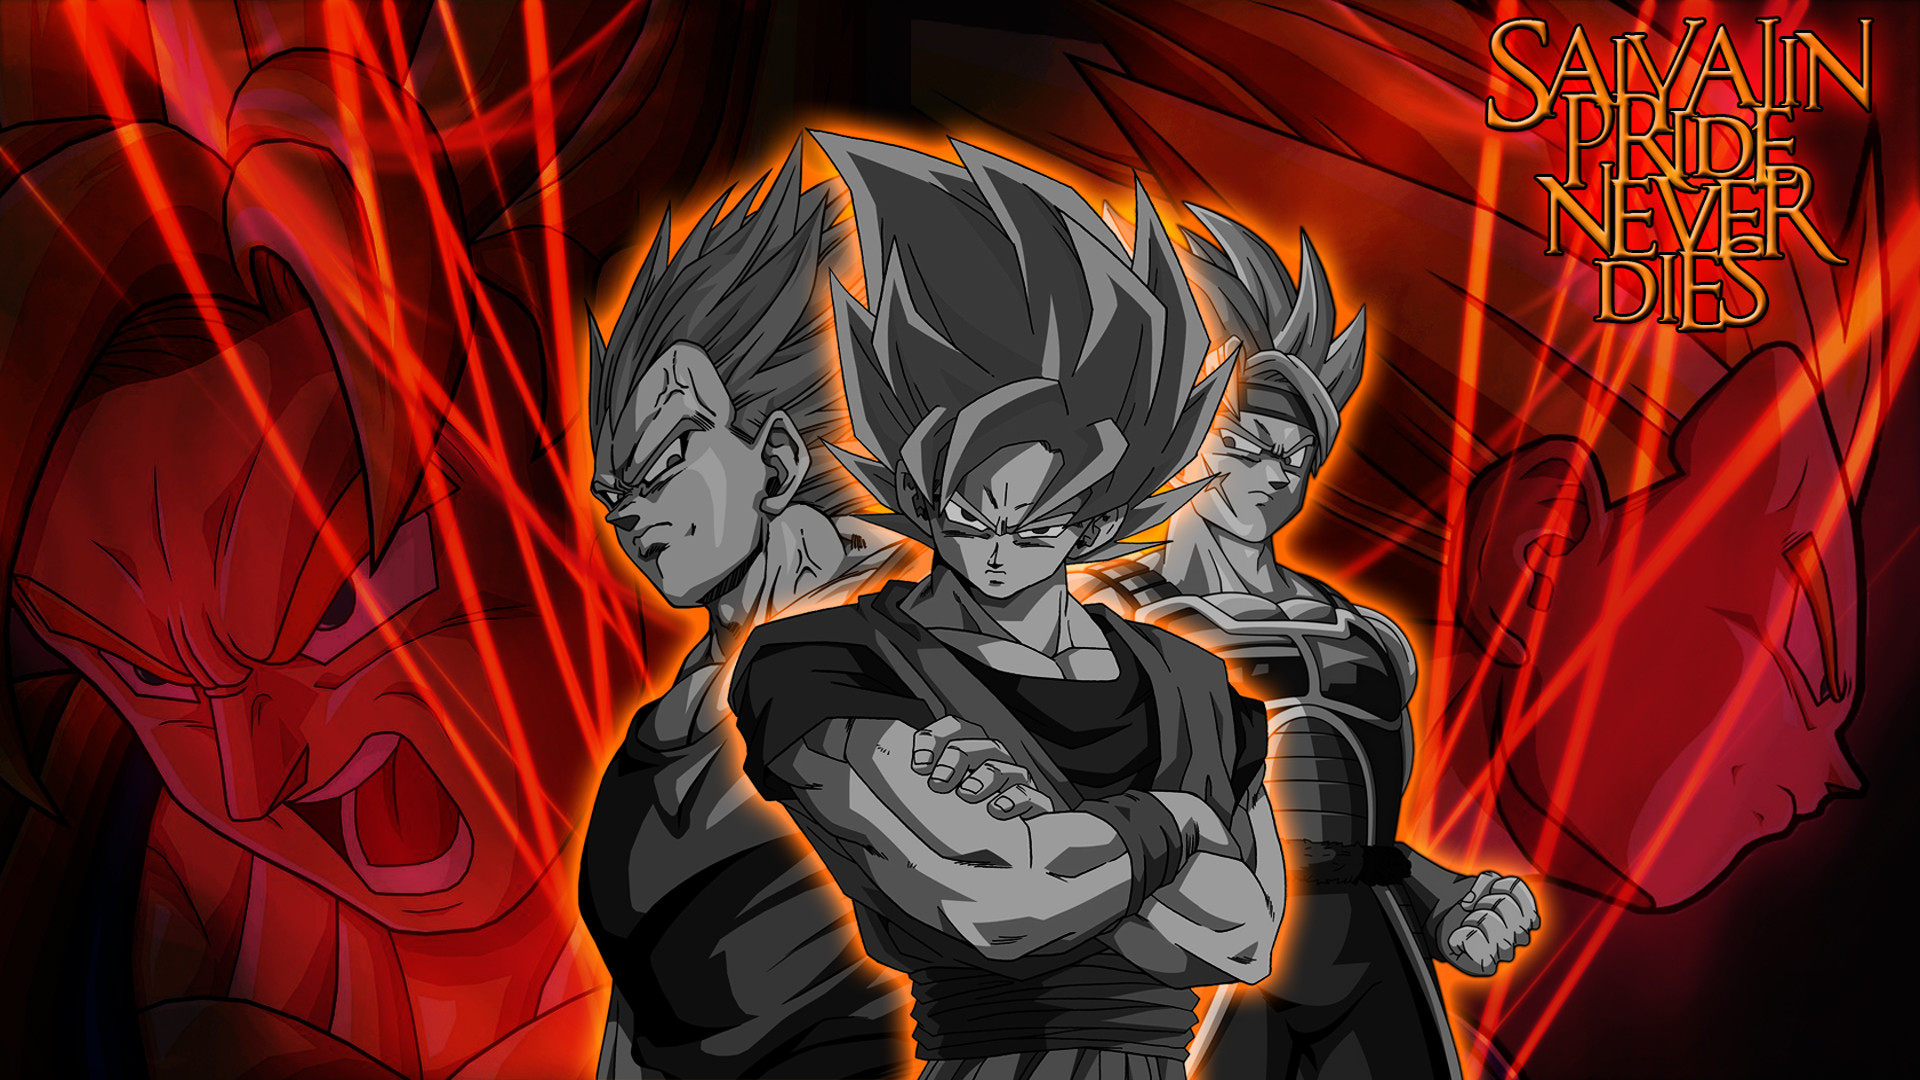 … DBZ wallpaper (Bardock, Goku and Vegeta) by ryokentou